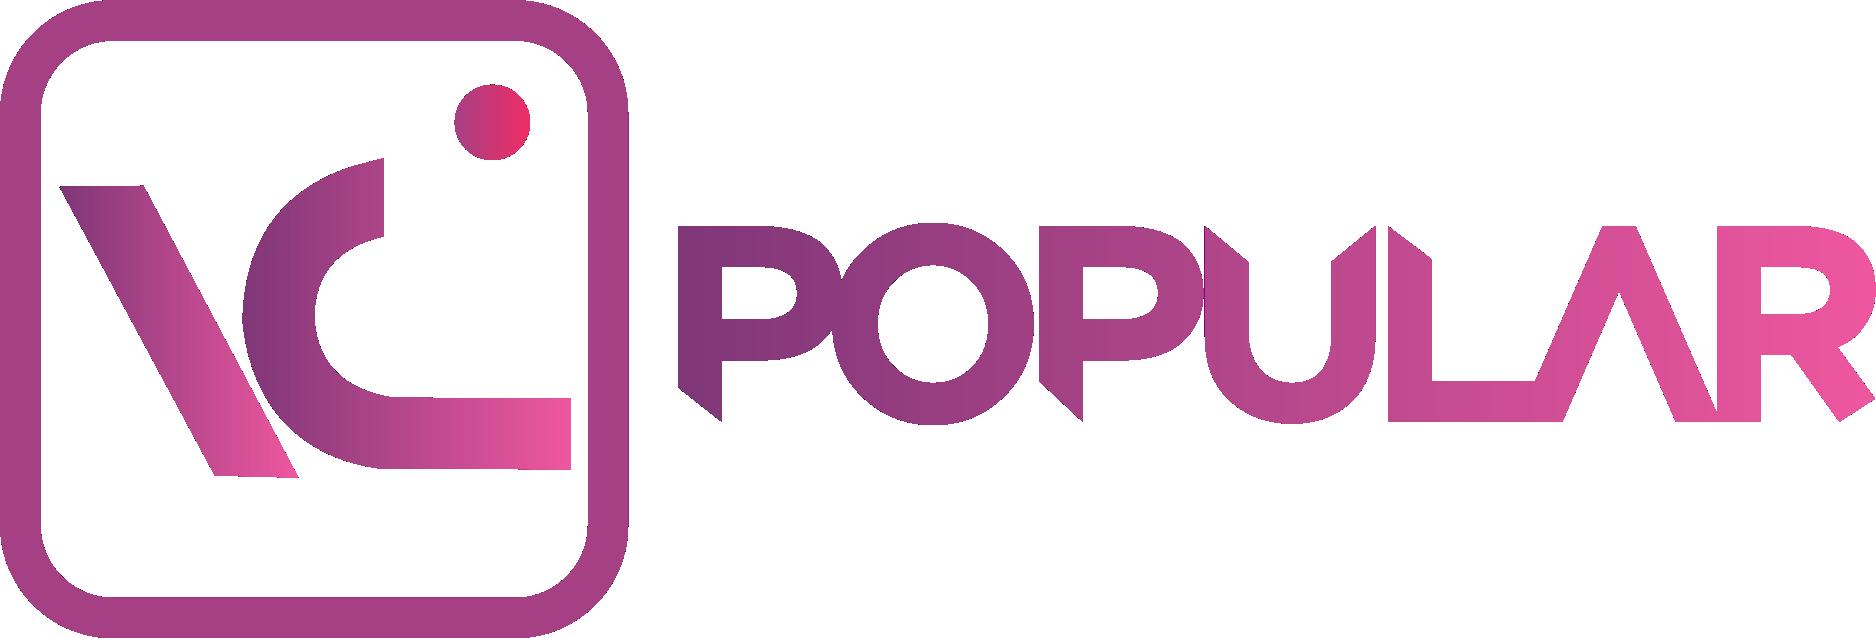 Vc Popular